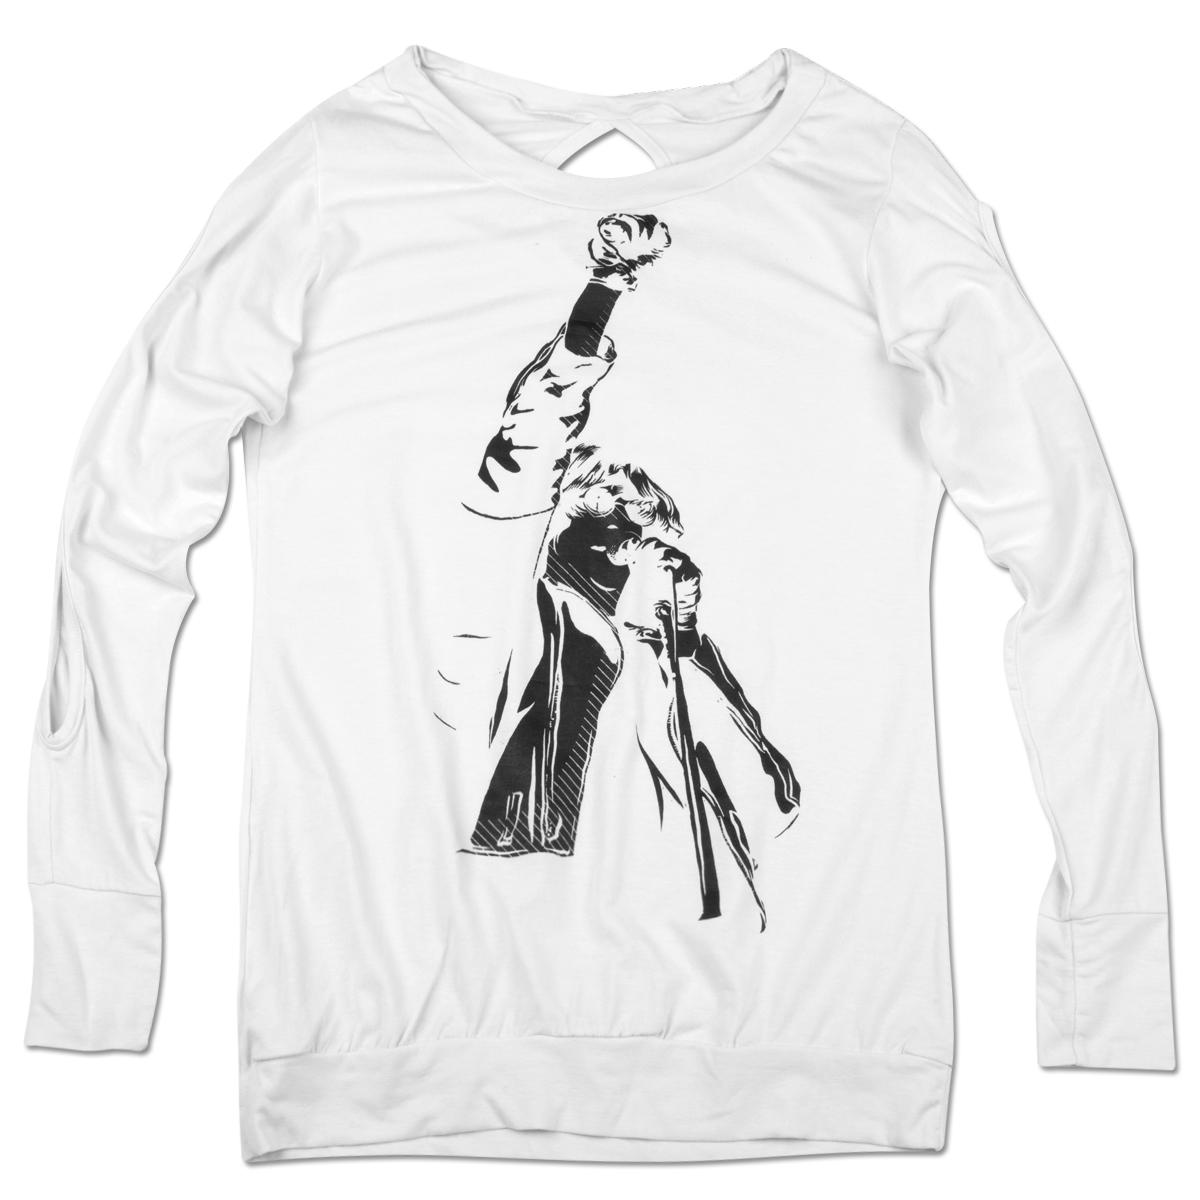 Ladies White JR Fist L/S Shirt